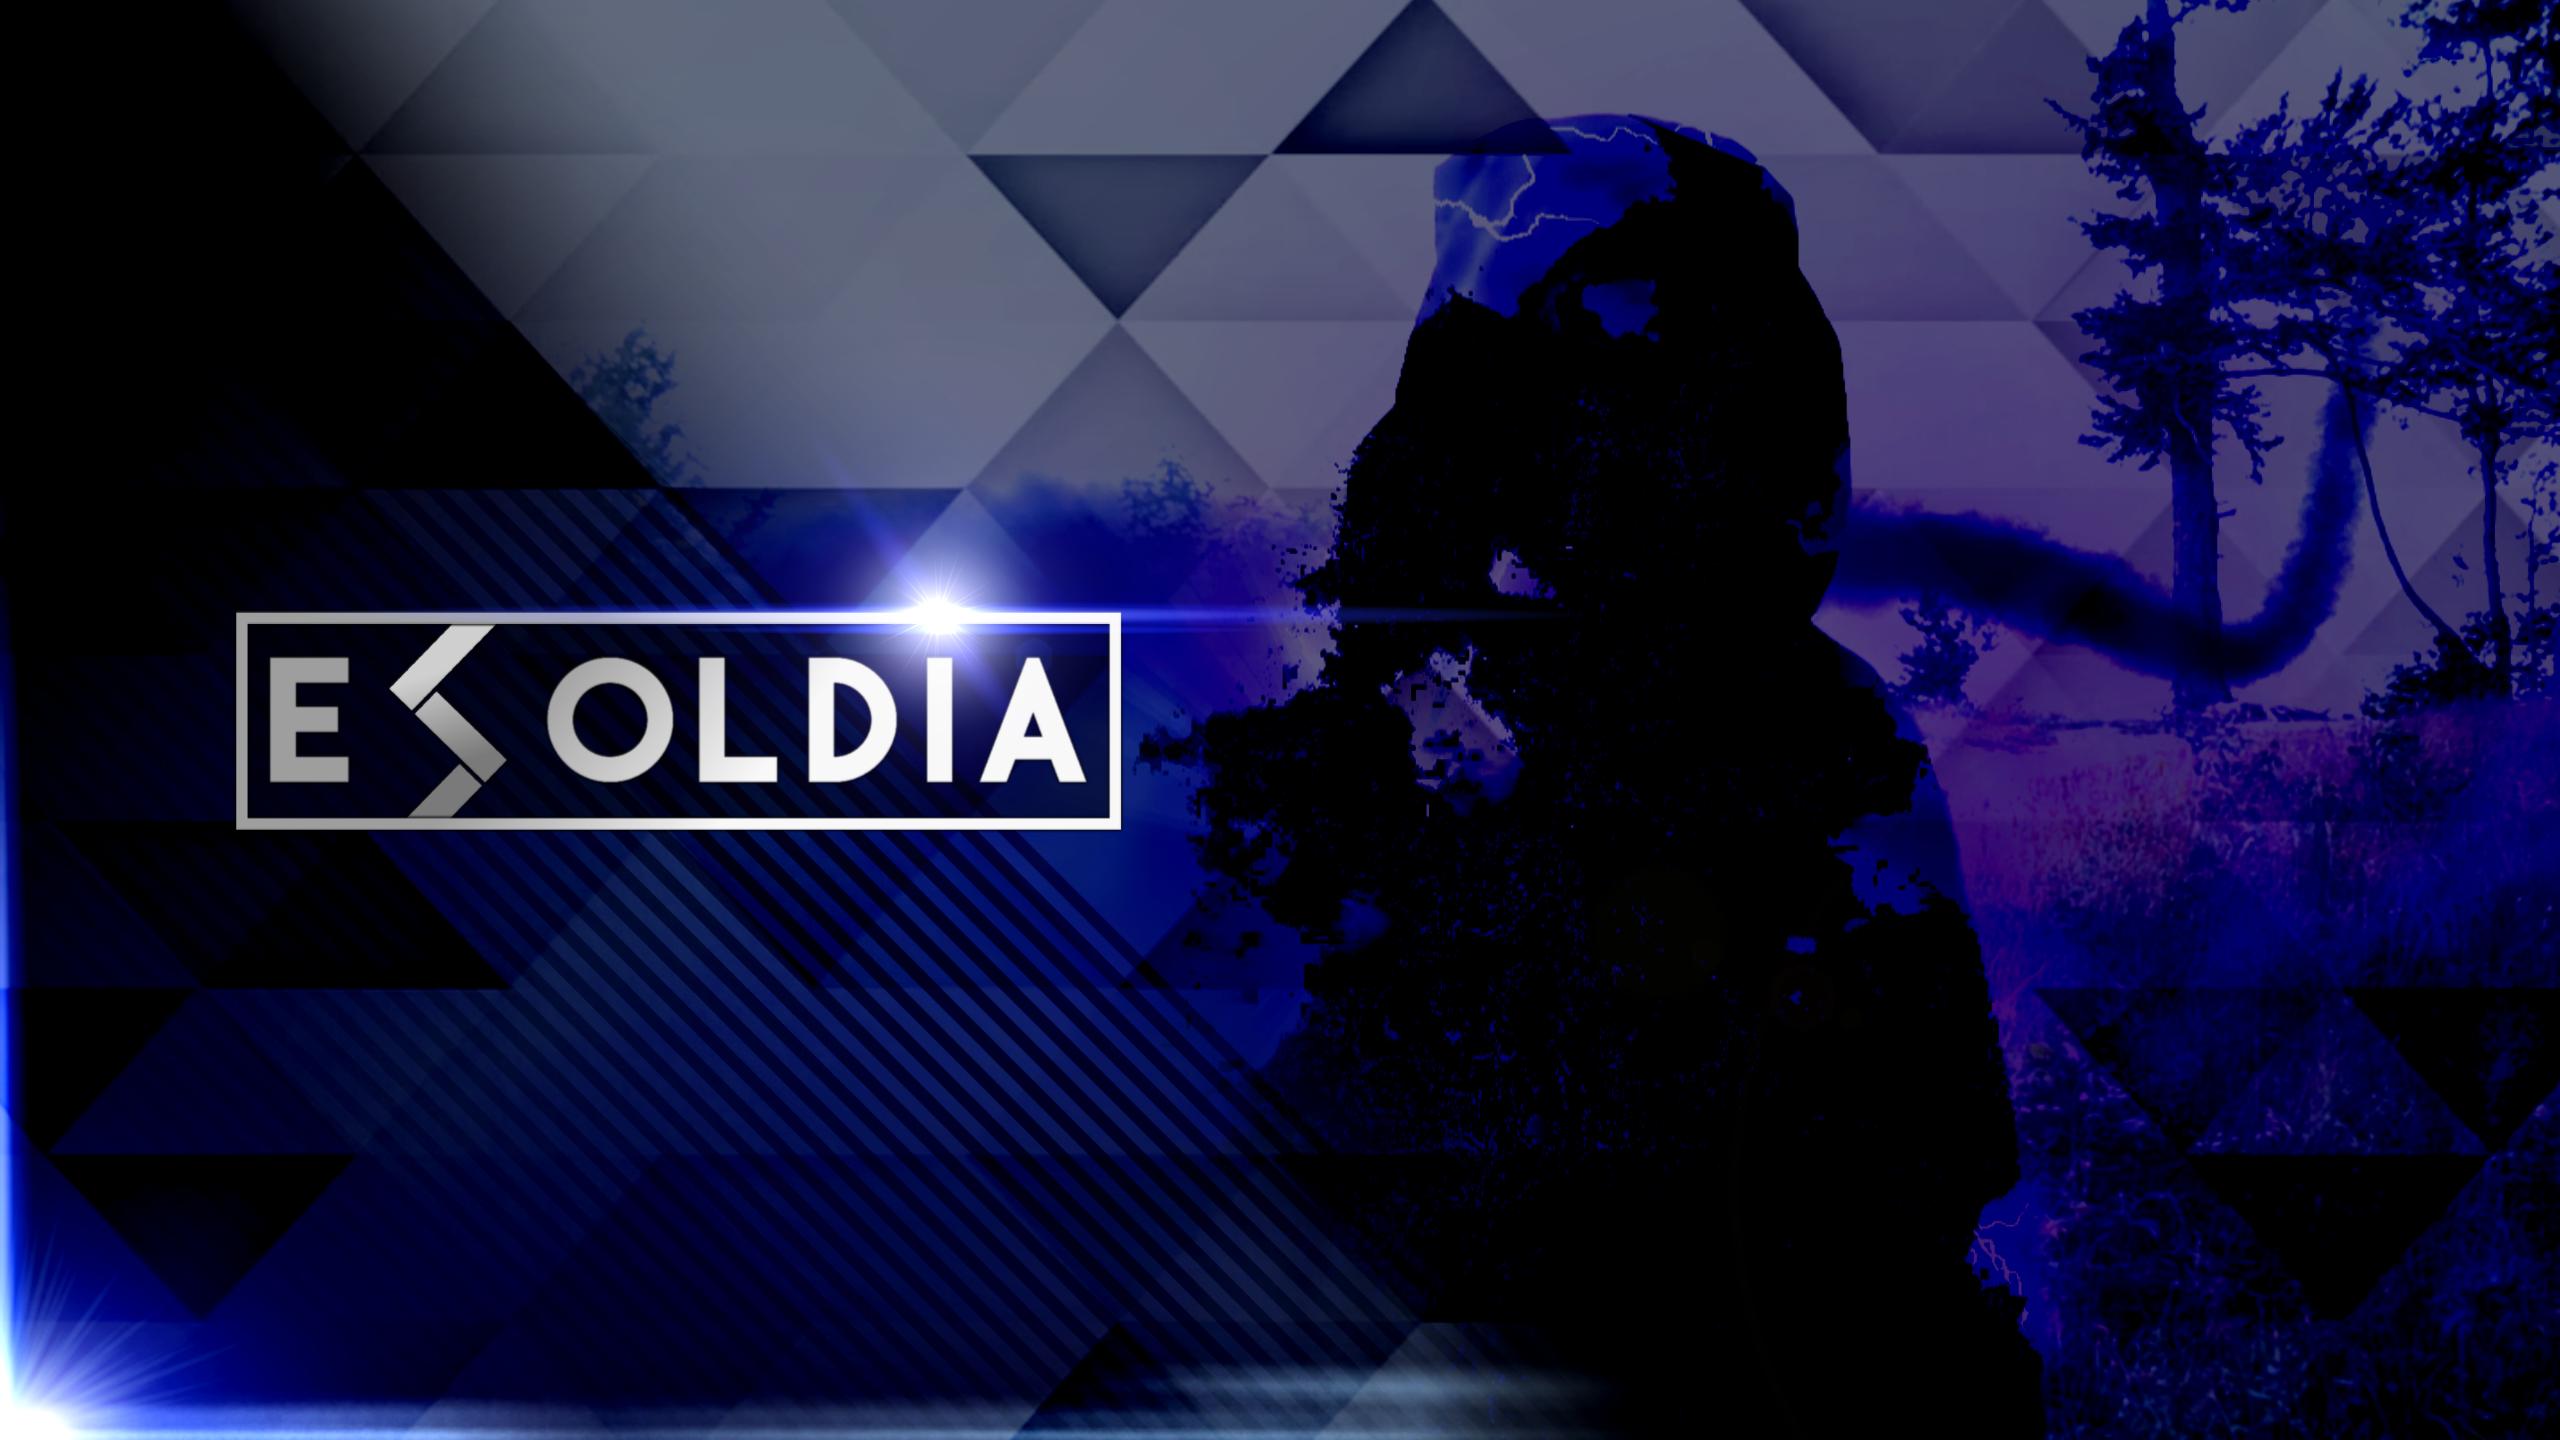 Esoldia/